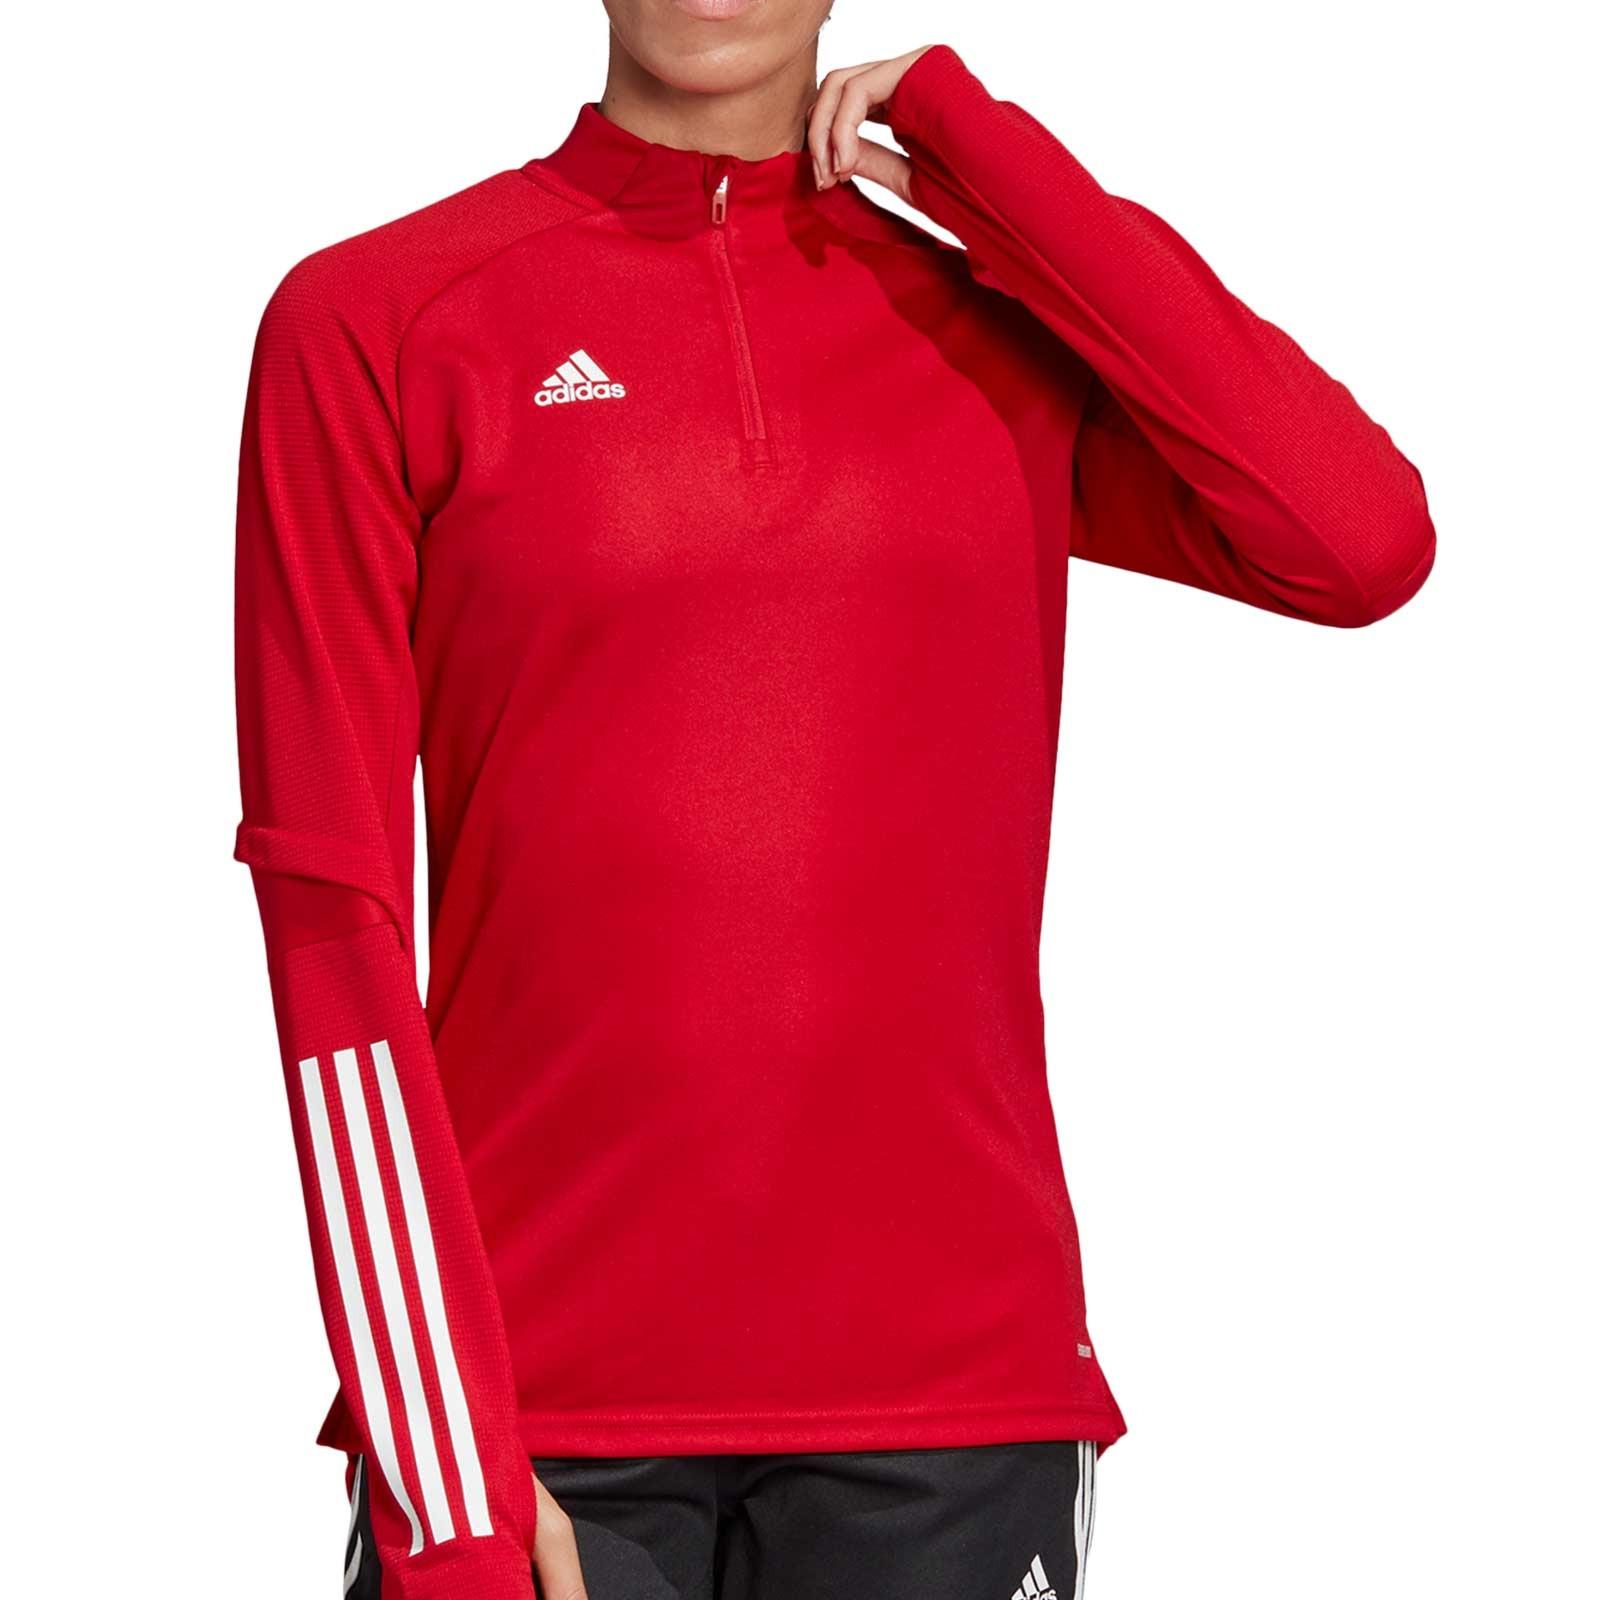 Legítimo gene entrevista  Sudadera adidas Condivo 20 mujer roja | futbolmania